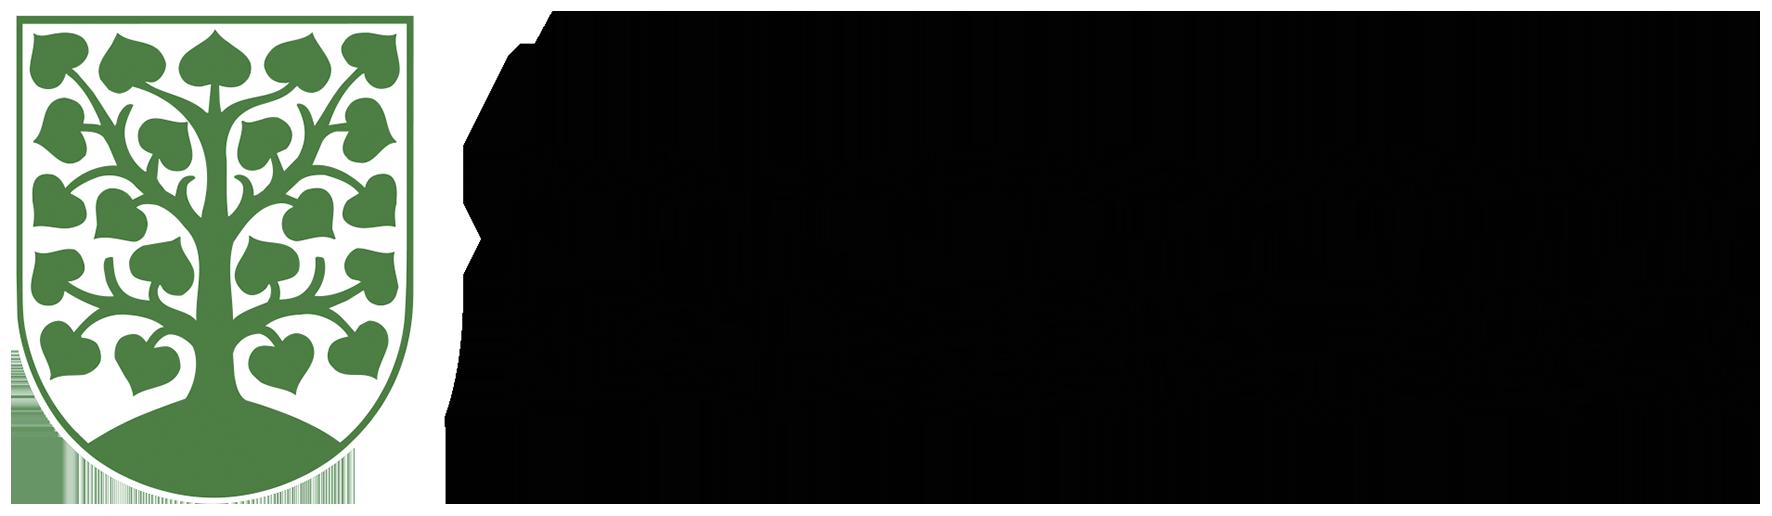 Rainer Lambert, Bauverwaltung/Vergabe